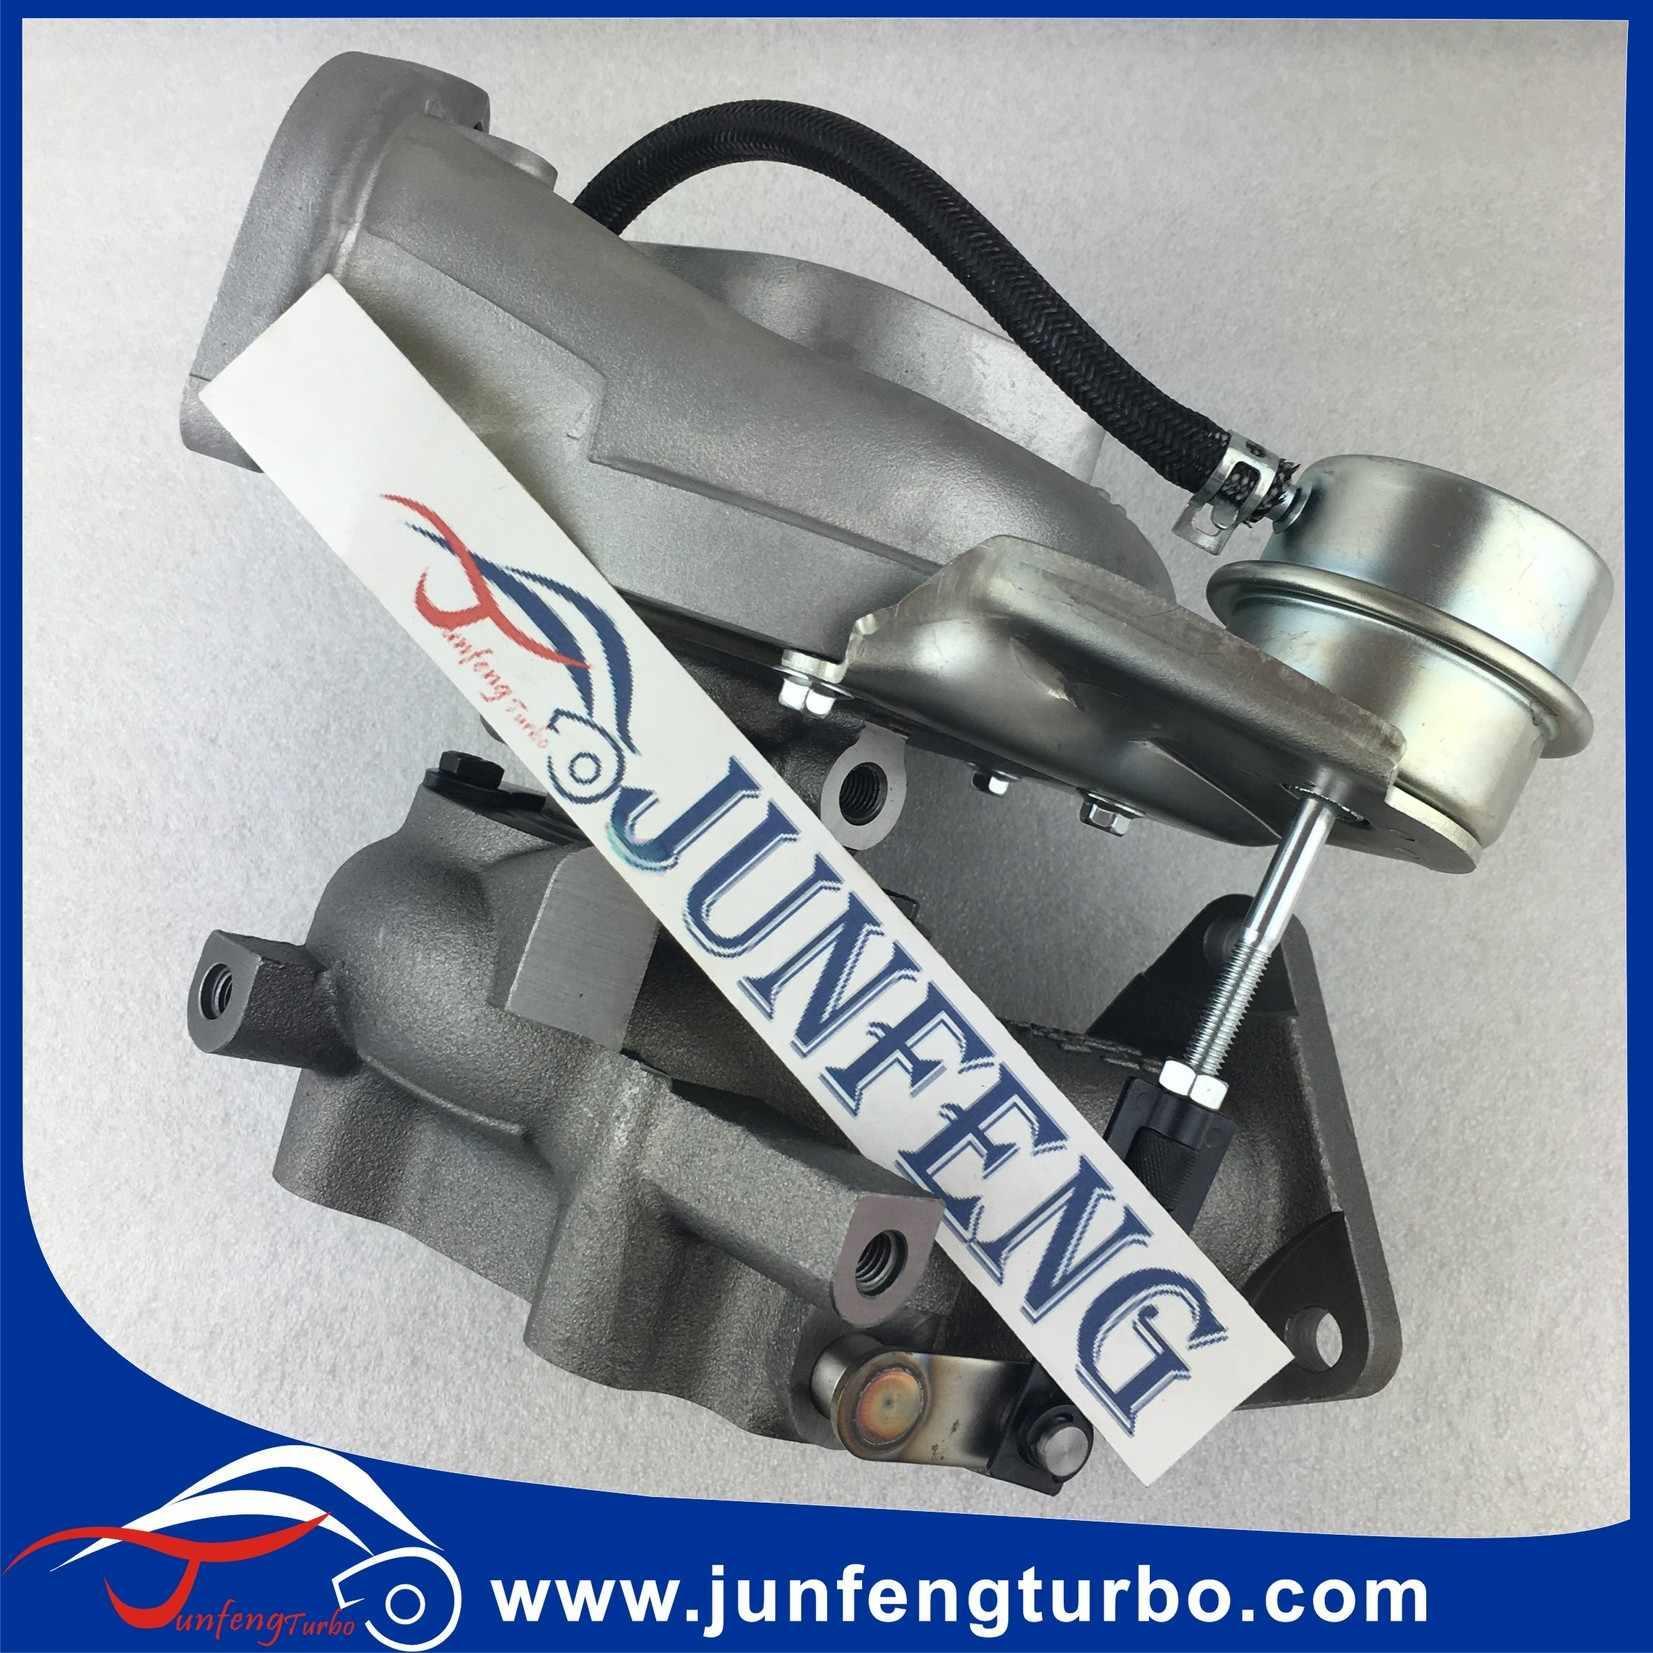 GT2056 Turbo 775629-0005 14411-Y431A Nissan cabstar 775629-5005S